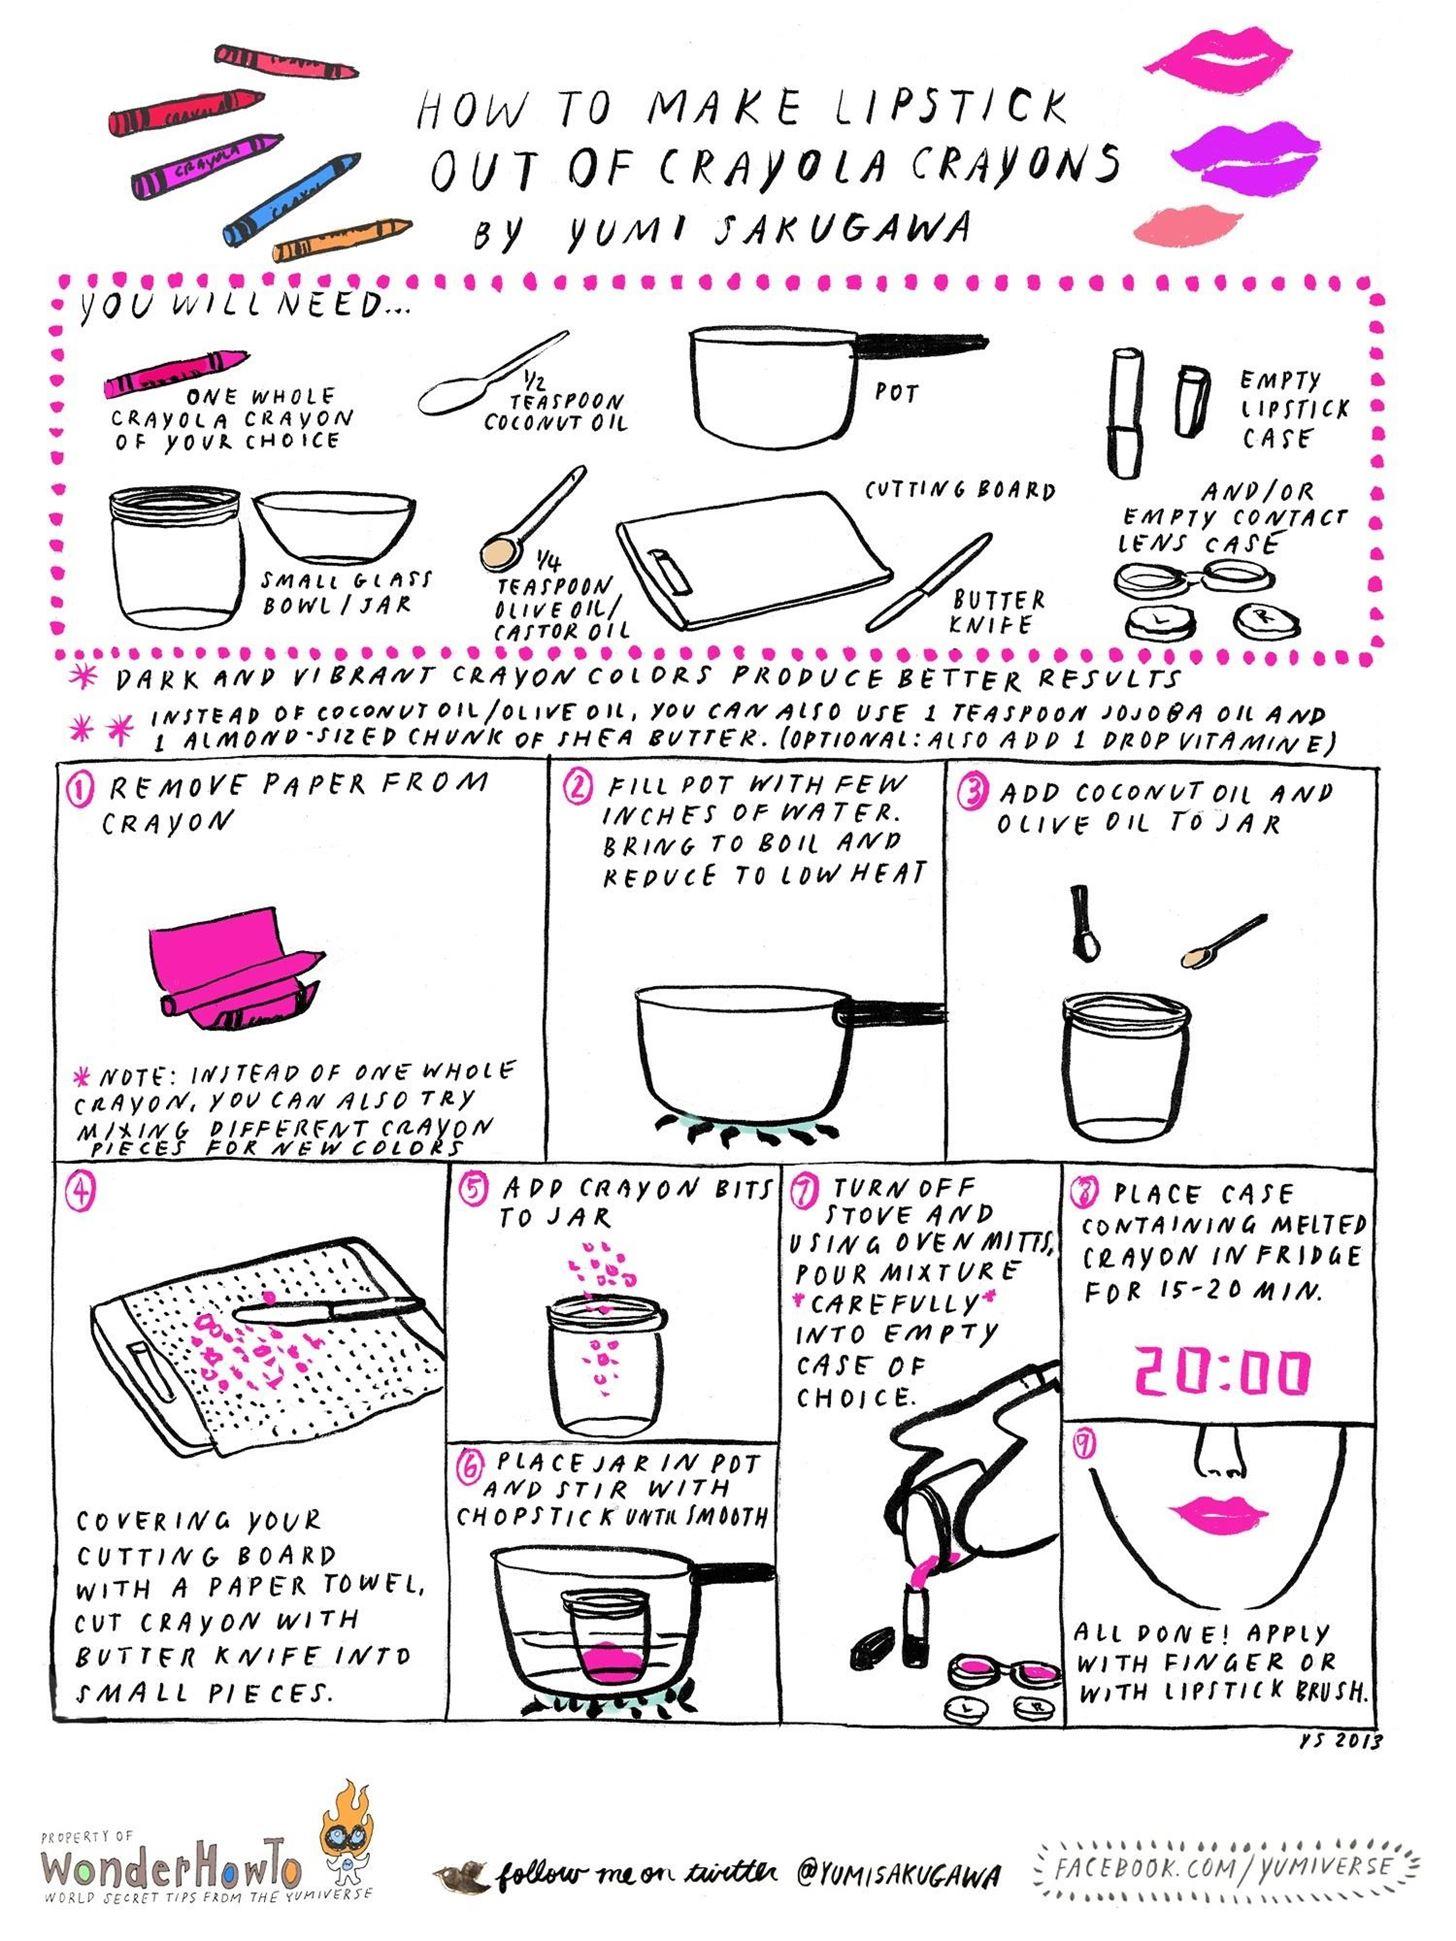 http://img.wonderhowto.com/img/63/67/63524771500861/0/make-your-own-diy-lipstick-out-crayola-crayons.w1456.jpg